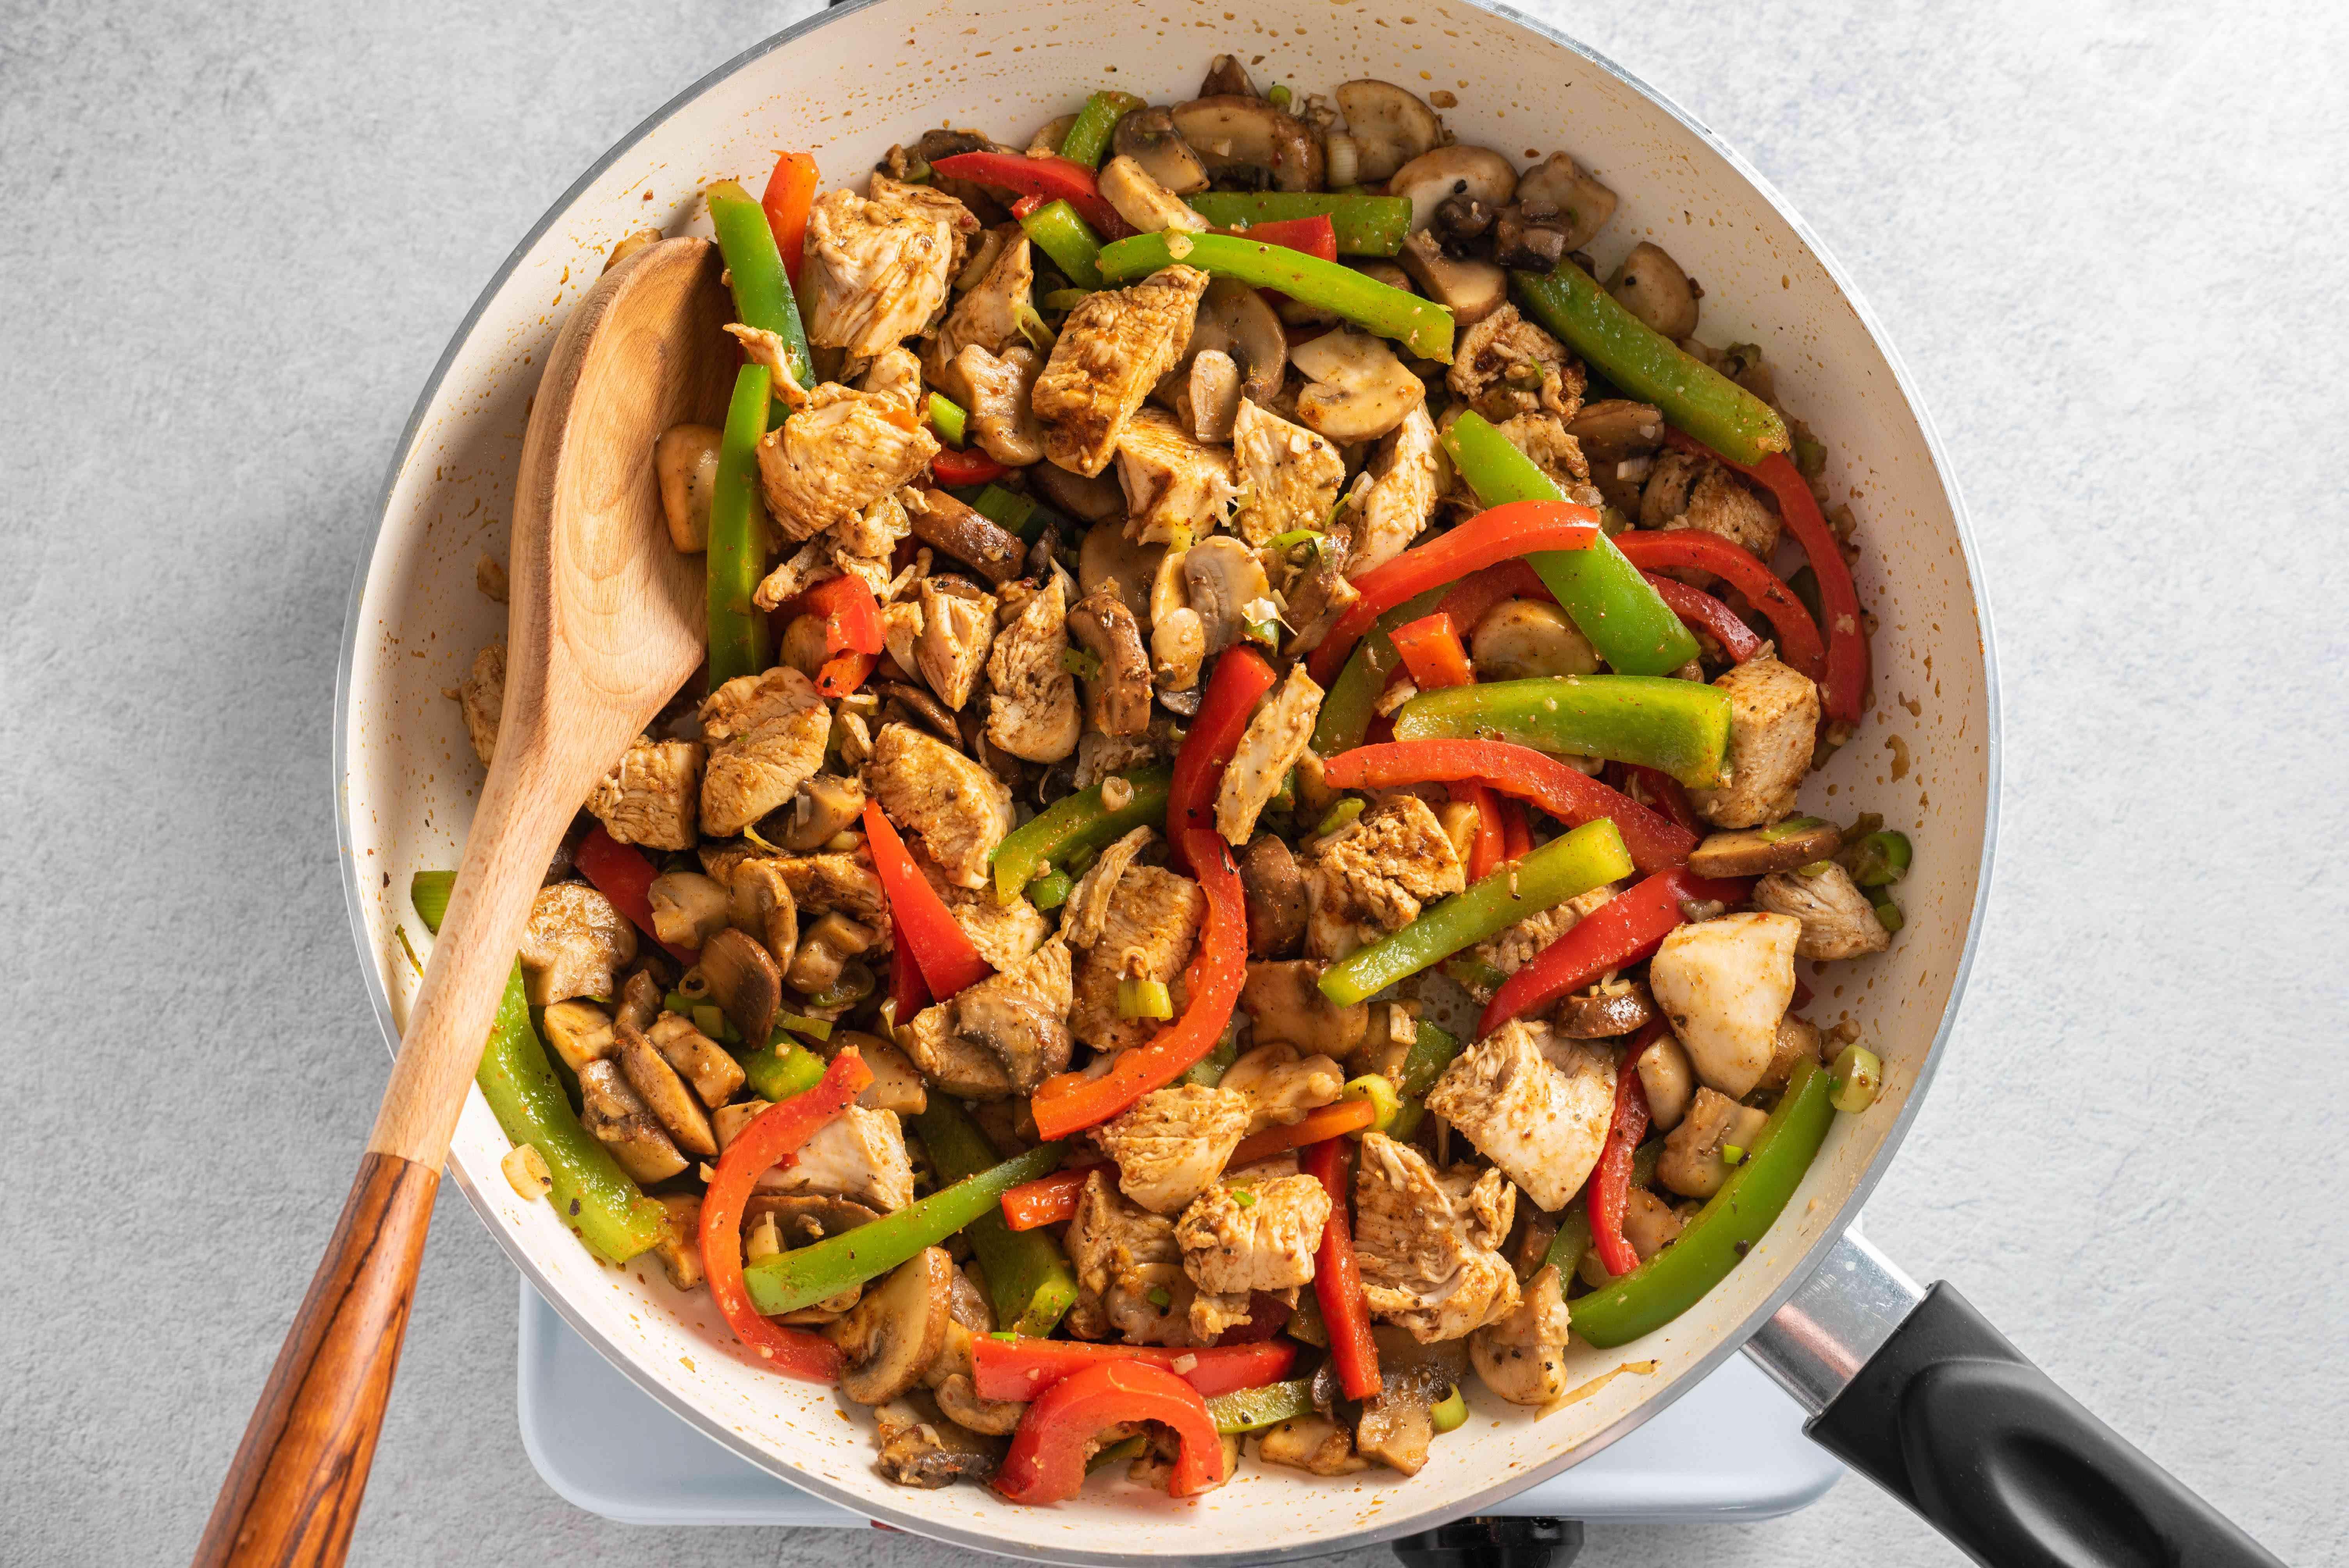 Stir in Cajun seasoning